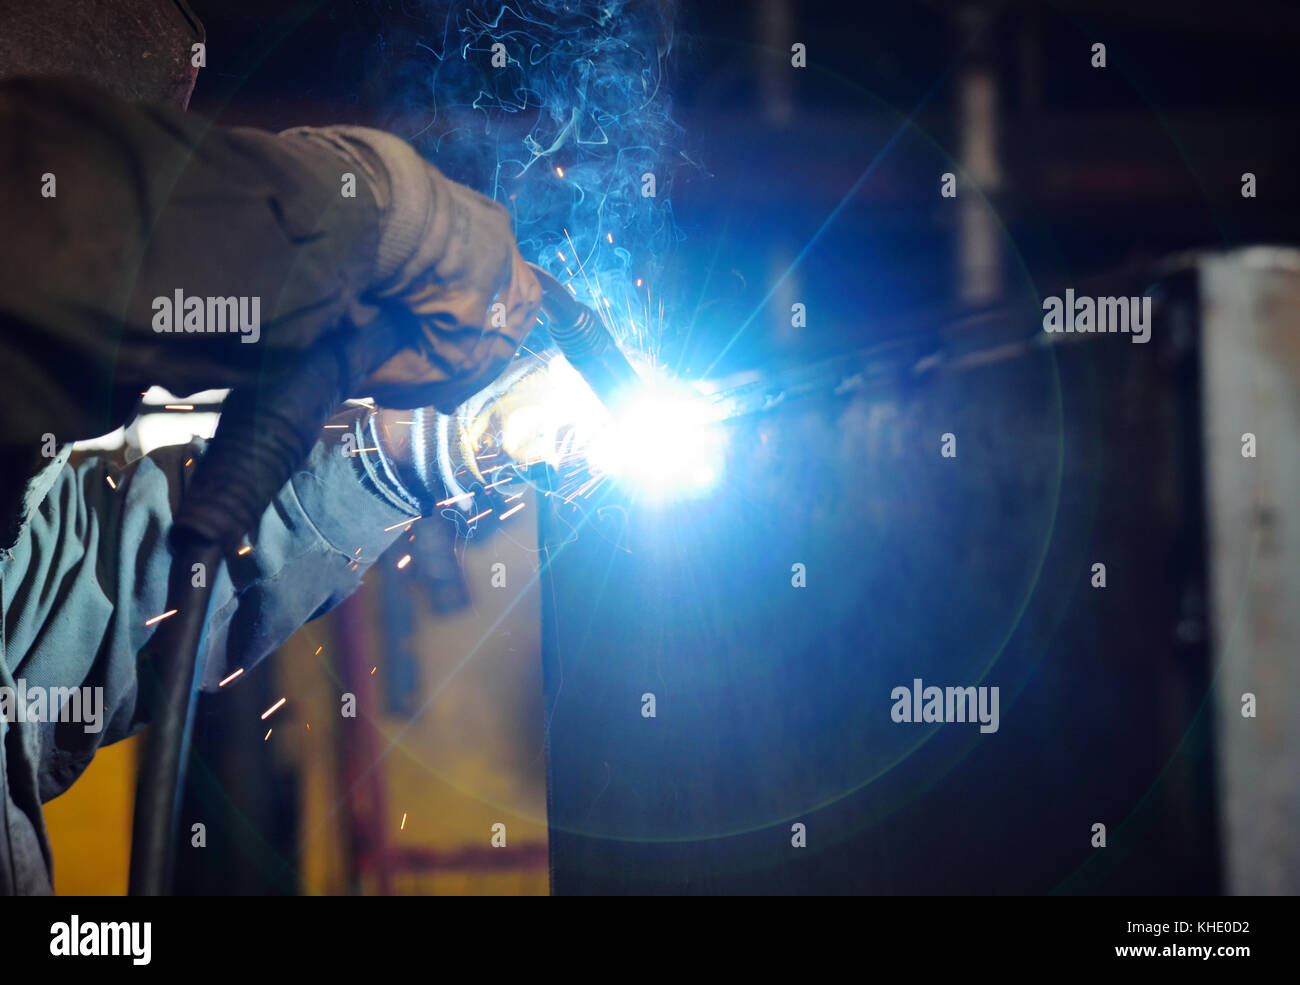 Welder for his work. - Stock Image